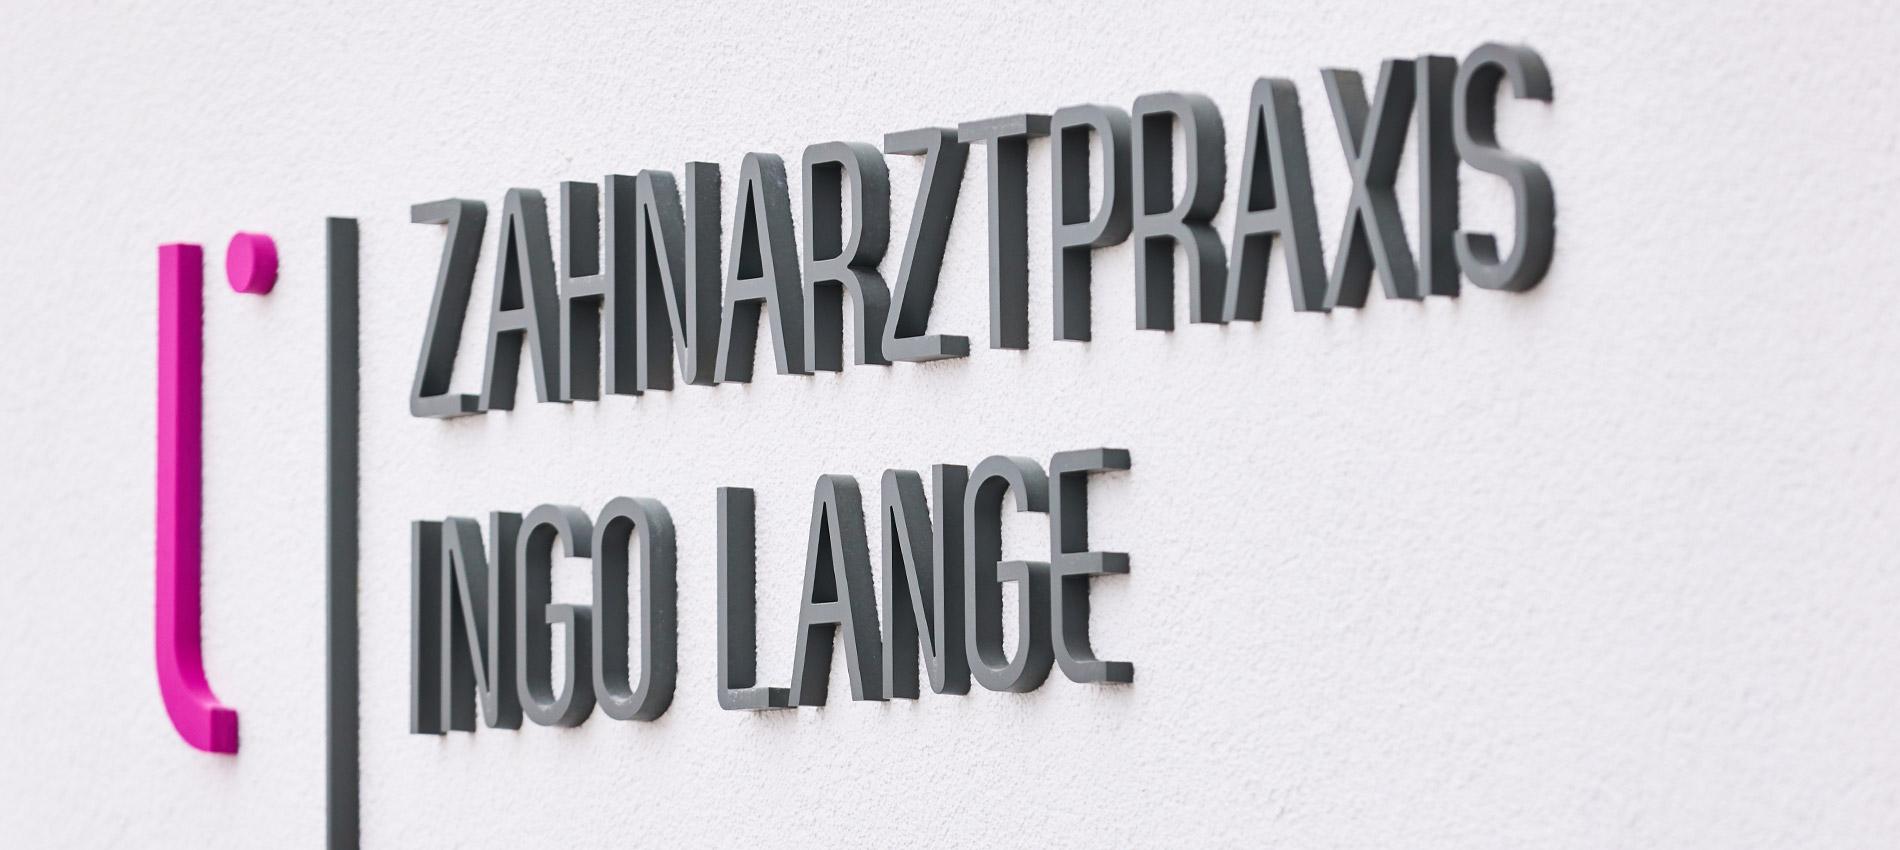 Zahnarztpraxis Ingo Lange - Impressum 1